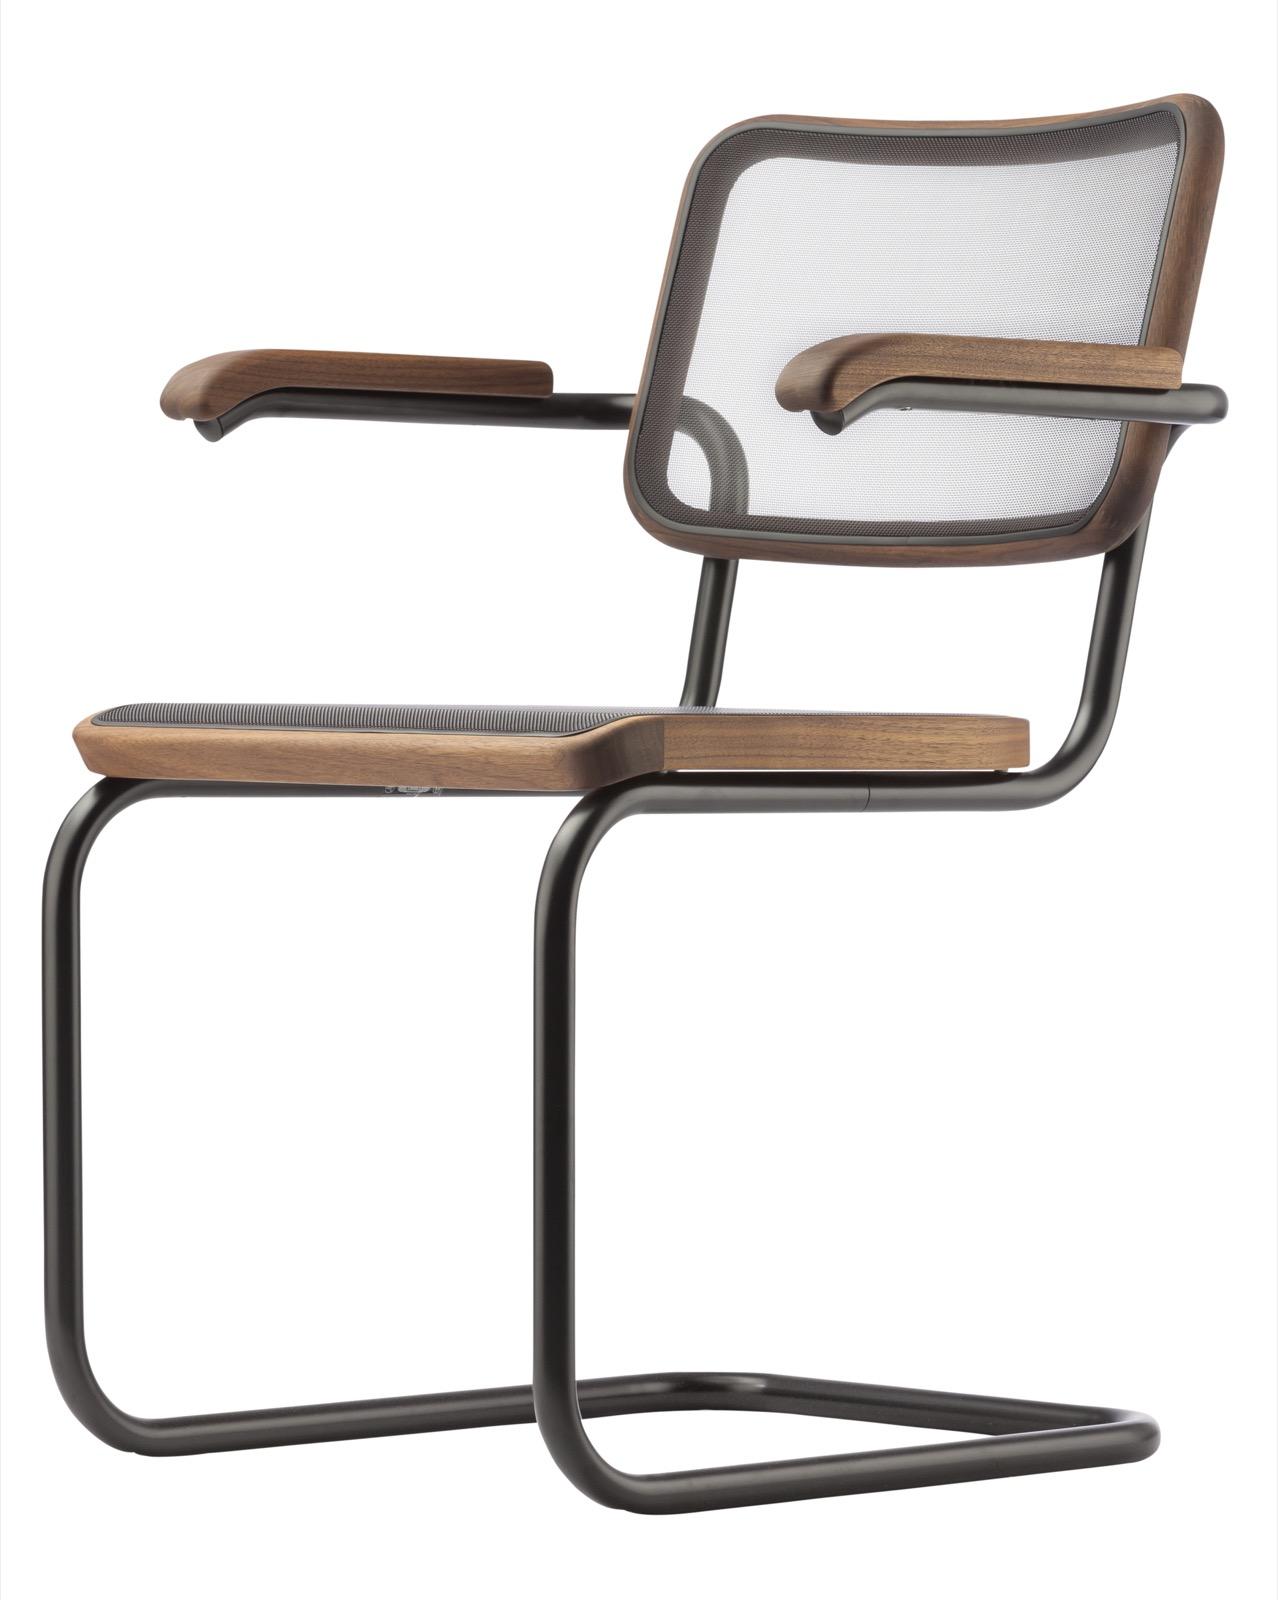 thonet s64n armstoel matser wageningen. Black Bedroom Furniture Sets. Home Design Ideas